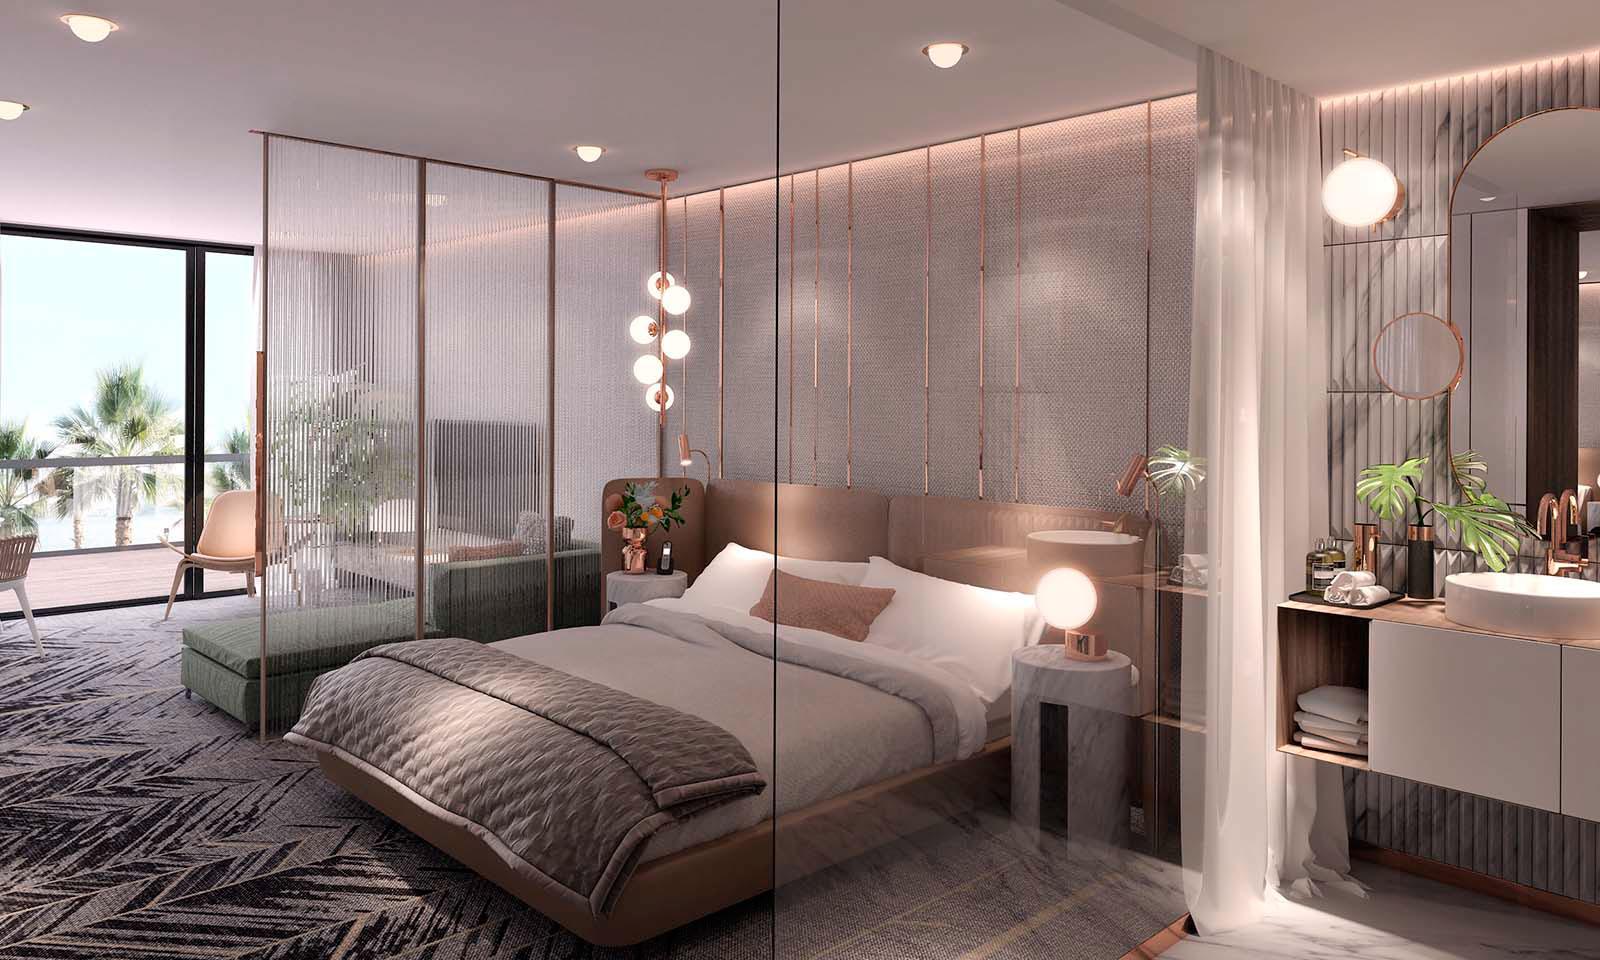 slaapkamer-ontwerp-met-koper-en-marmer